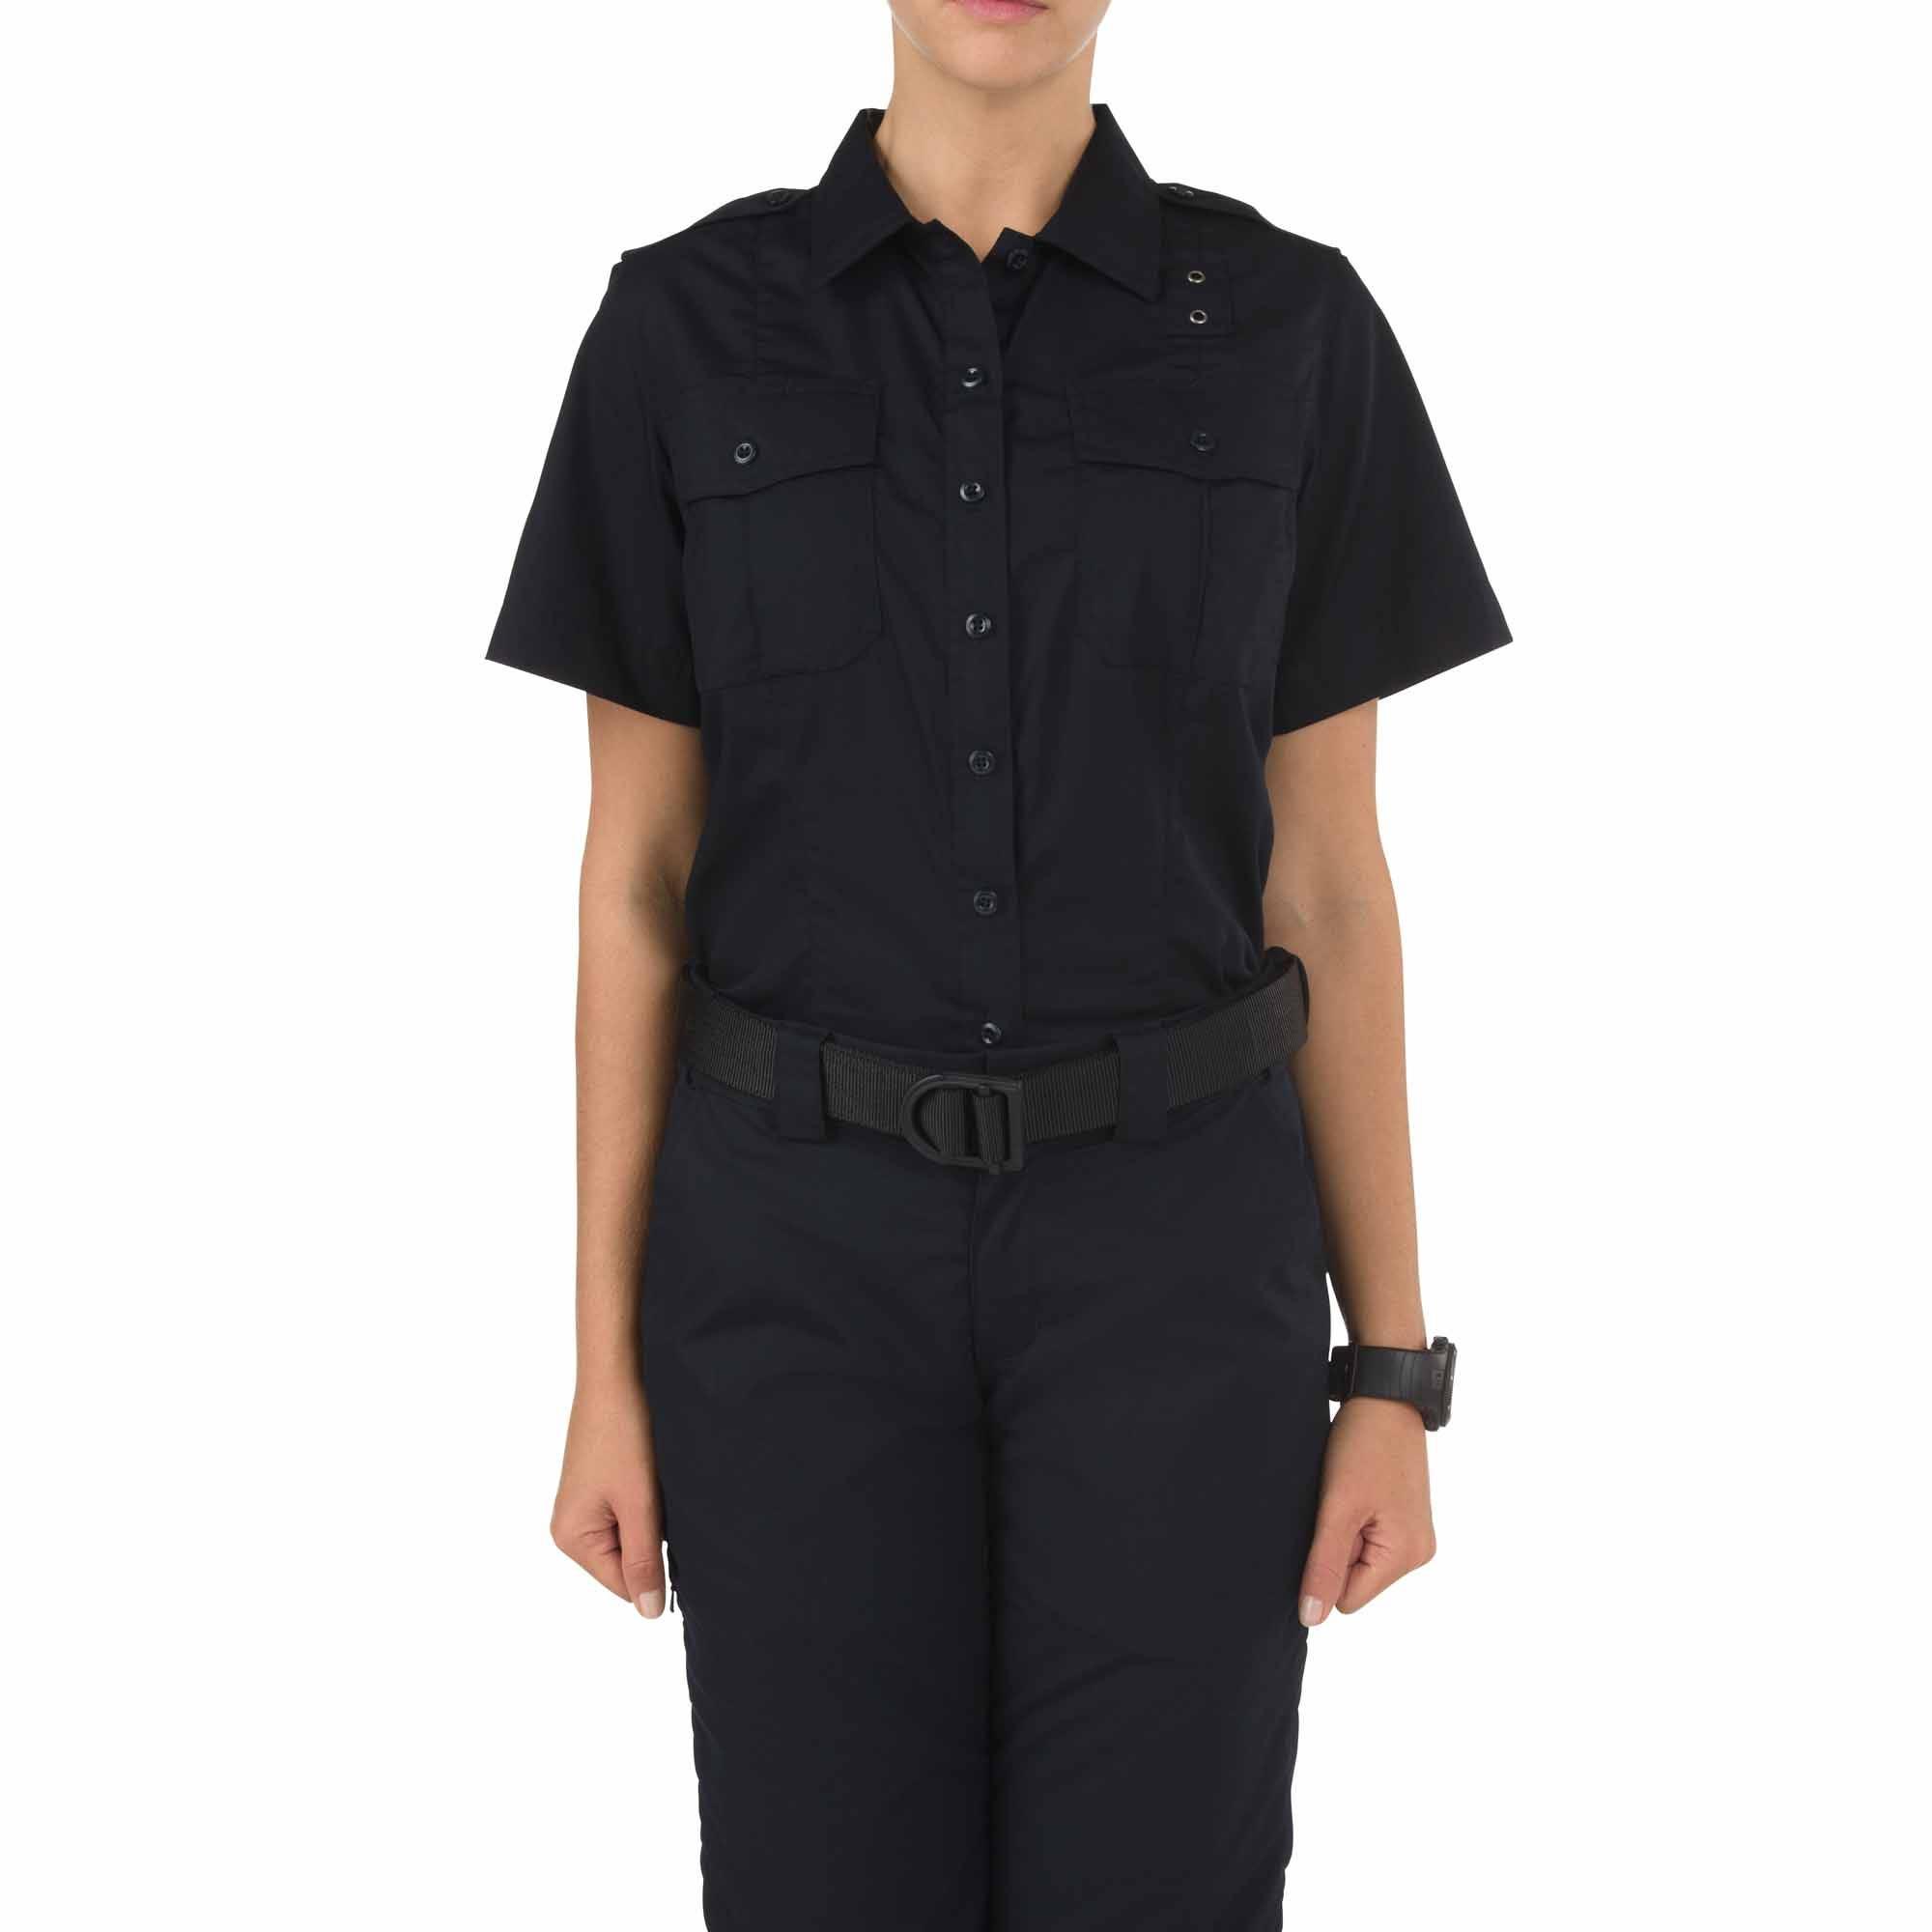 image of Women's TACLITE® PDU® Class-A Short Sleeve Shirt with sku: